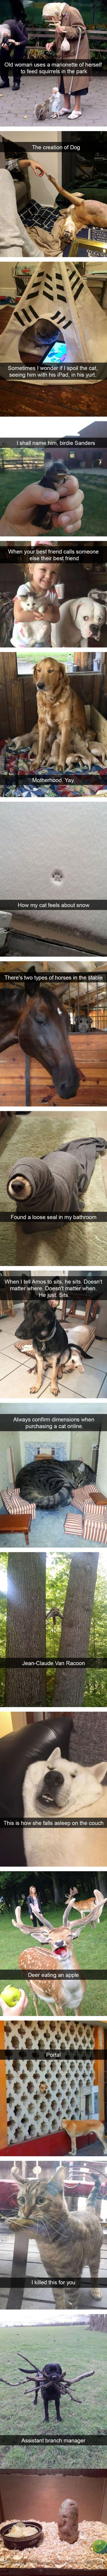 Animal Snapchats Guaranteed To Make You Laugh. Funny dogs